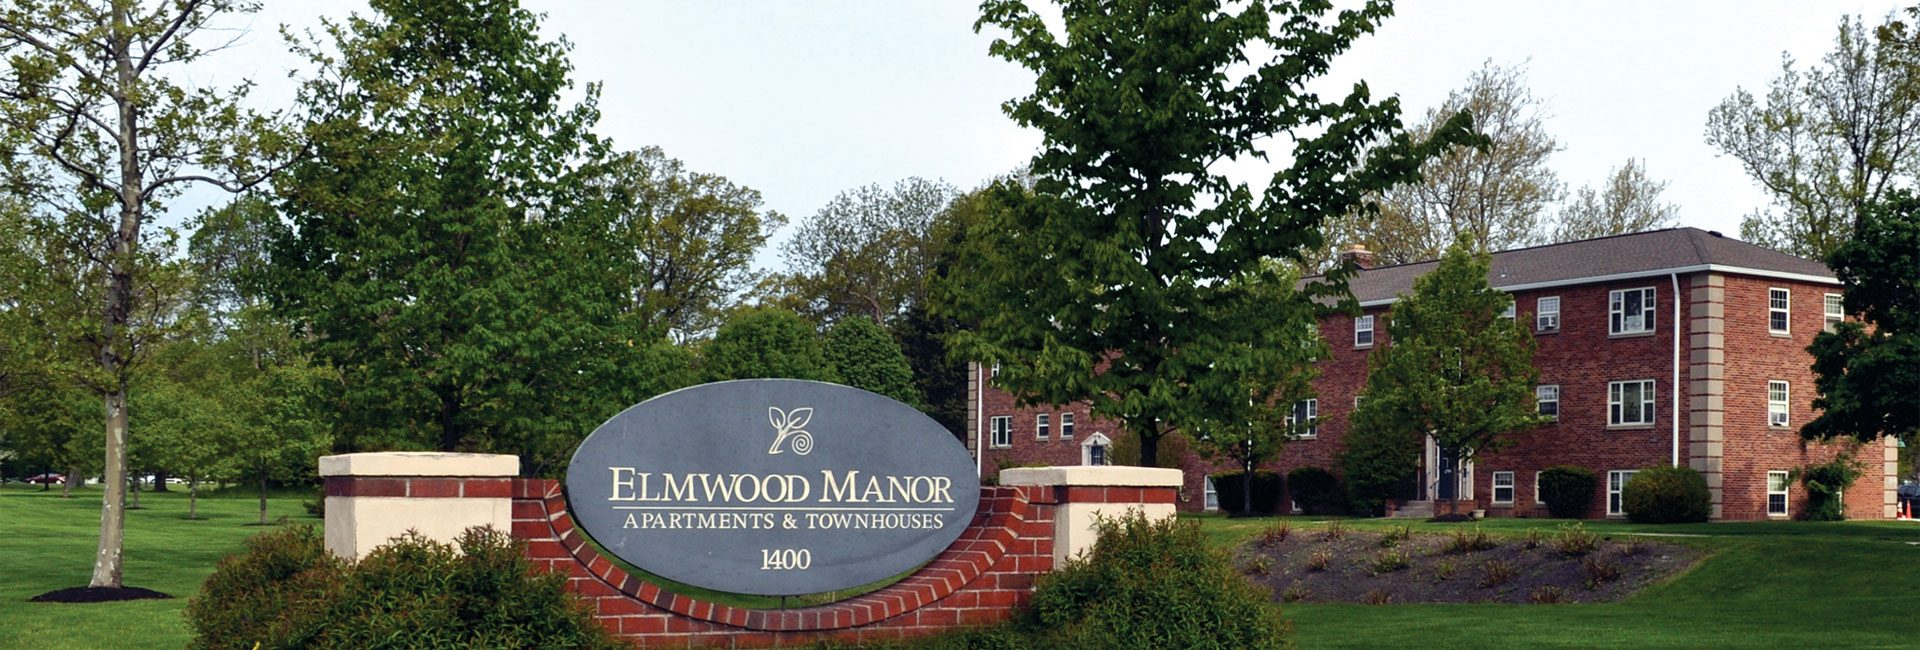 Elmwood Manor Sign